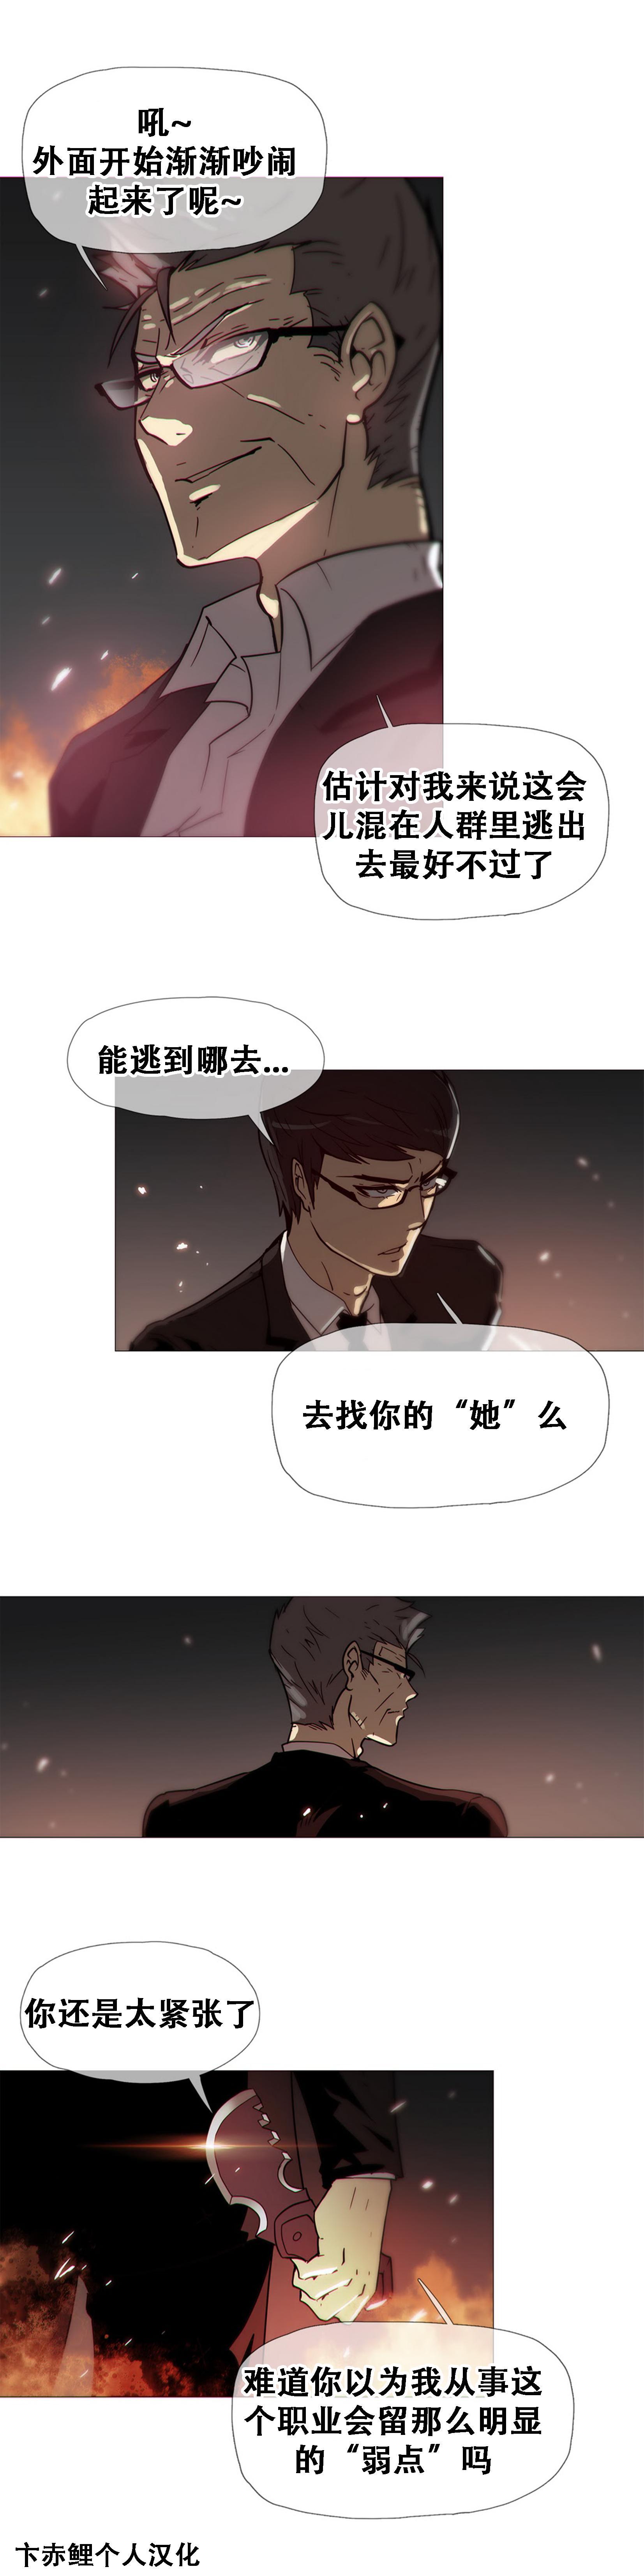 HouseHold Affairs 【卞赤鲤个人汉化】1~21话(持续更新中) 369